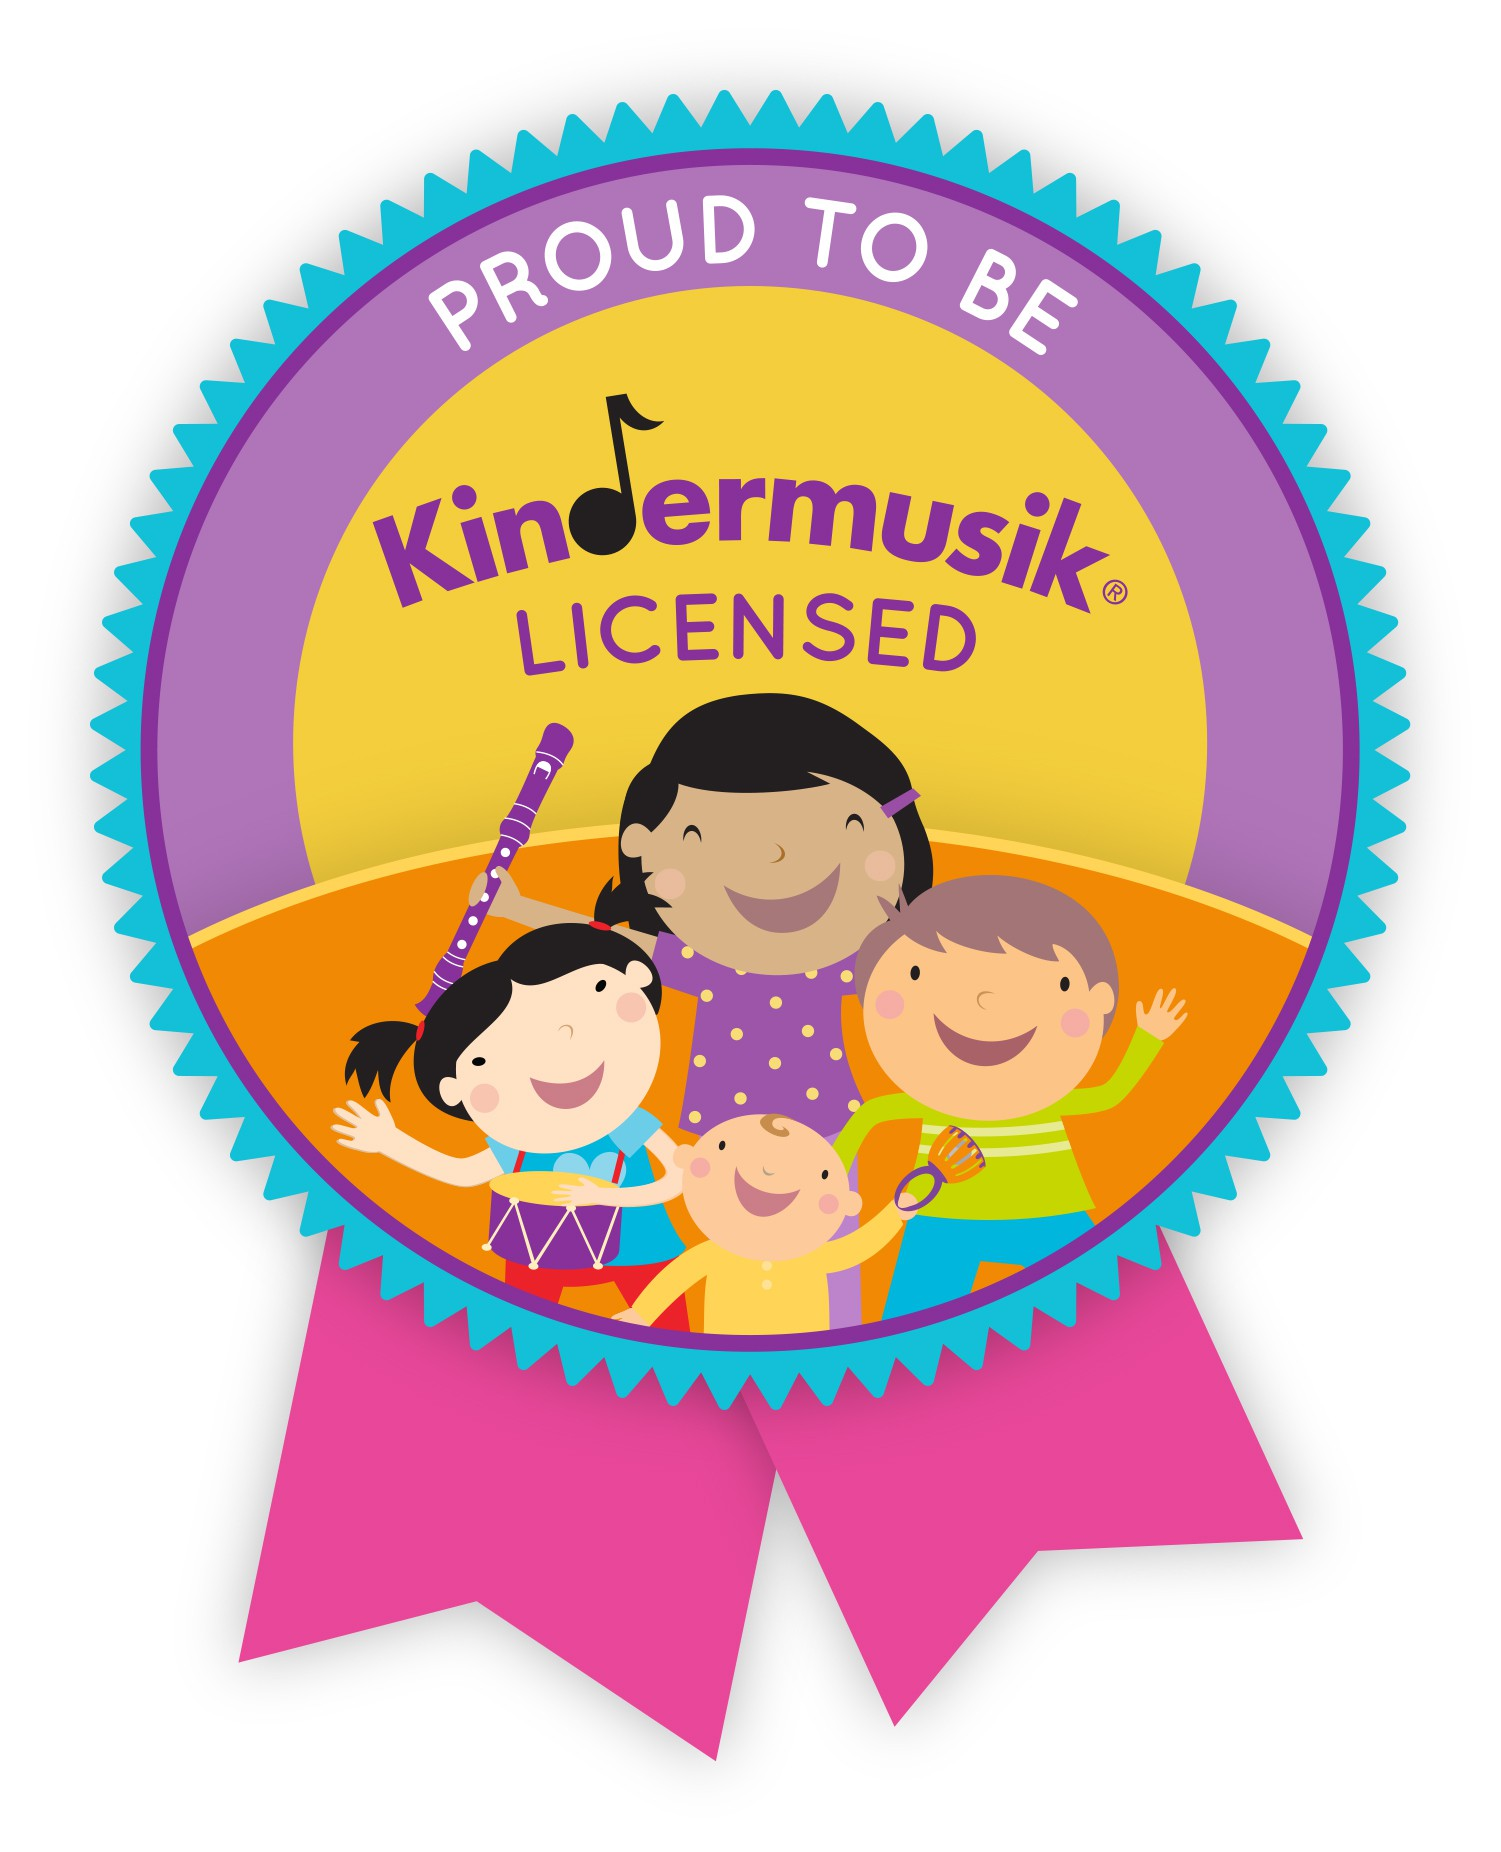 Graphic-Badge-Proud-to-be-Kindermusik-Licensed-1-1501x1852.jpg